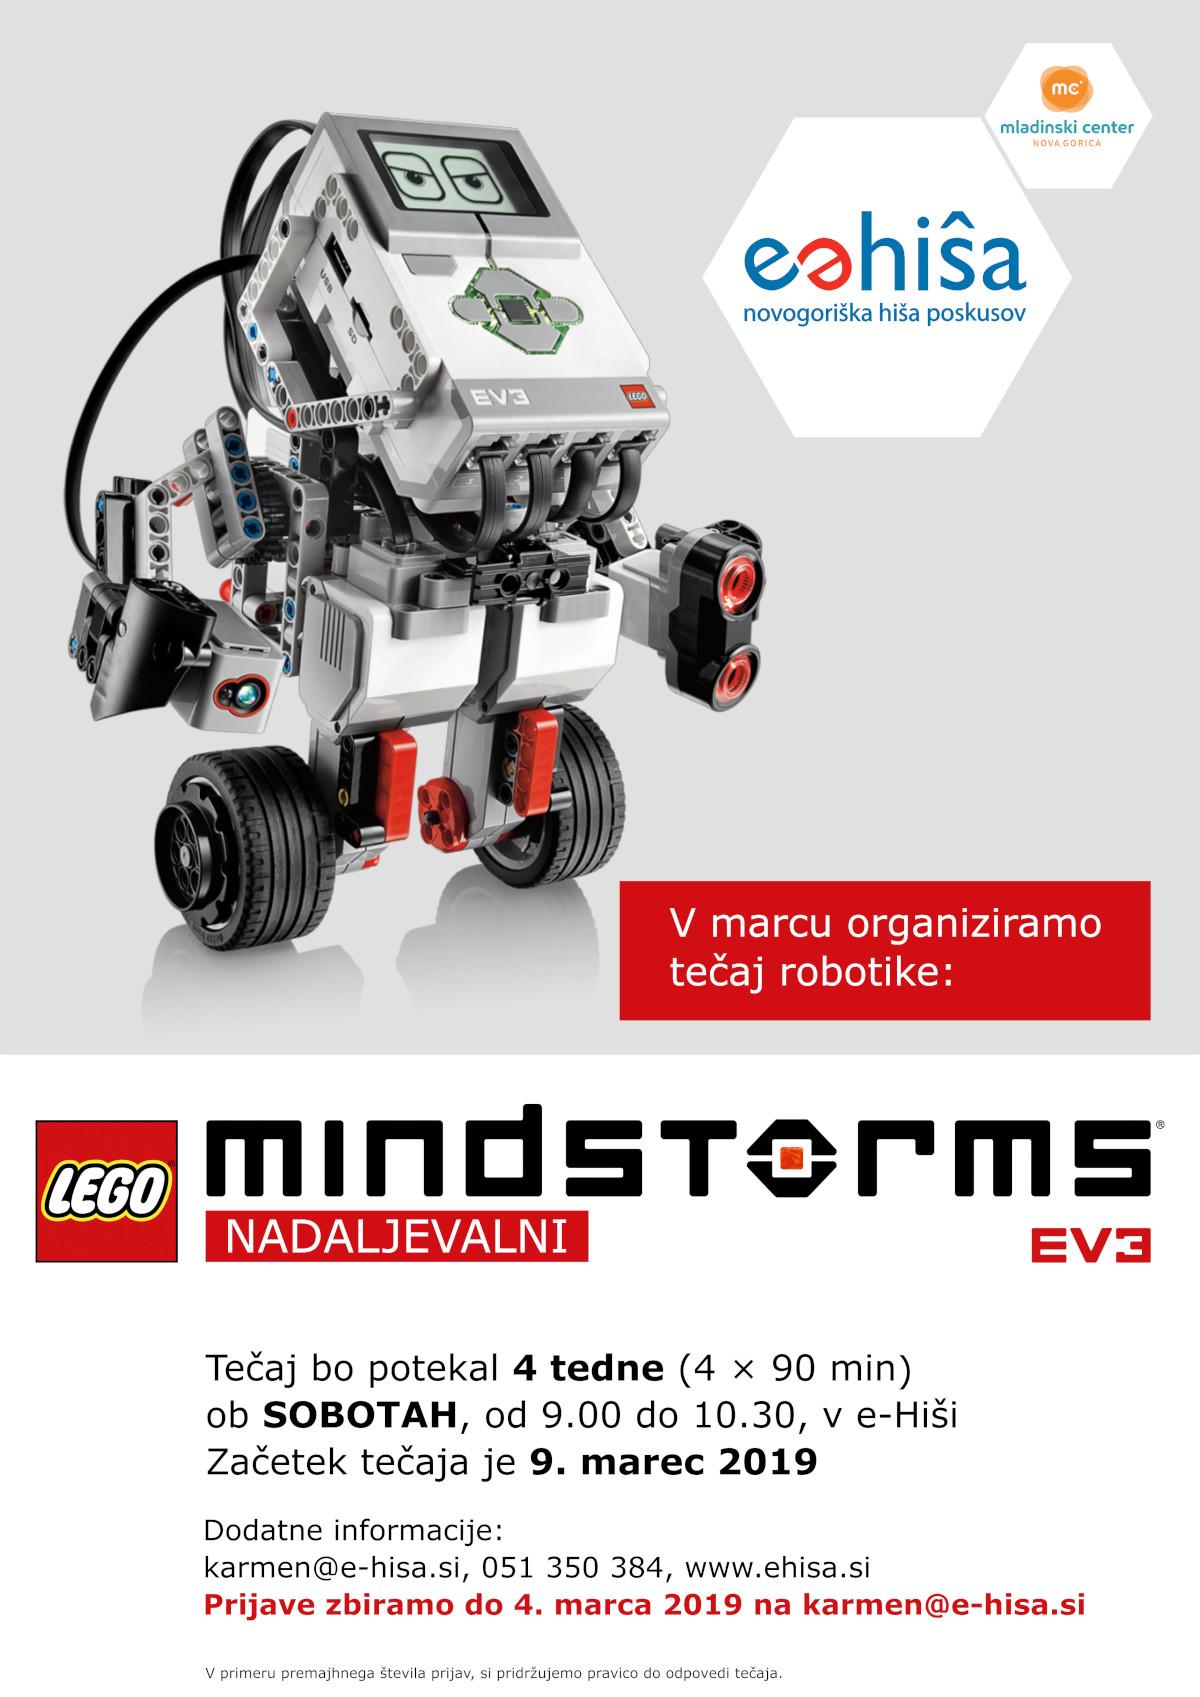 Lego_Mindstorms marec 2019 tečaj